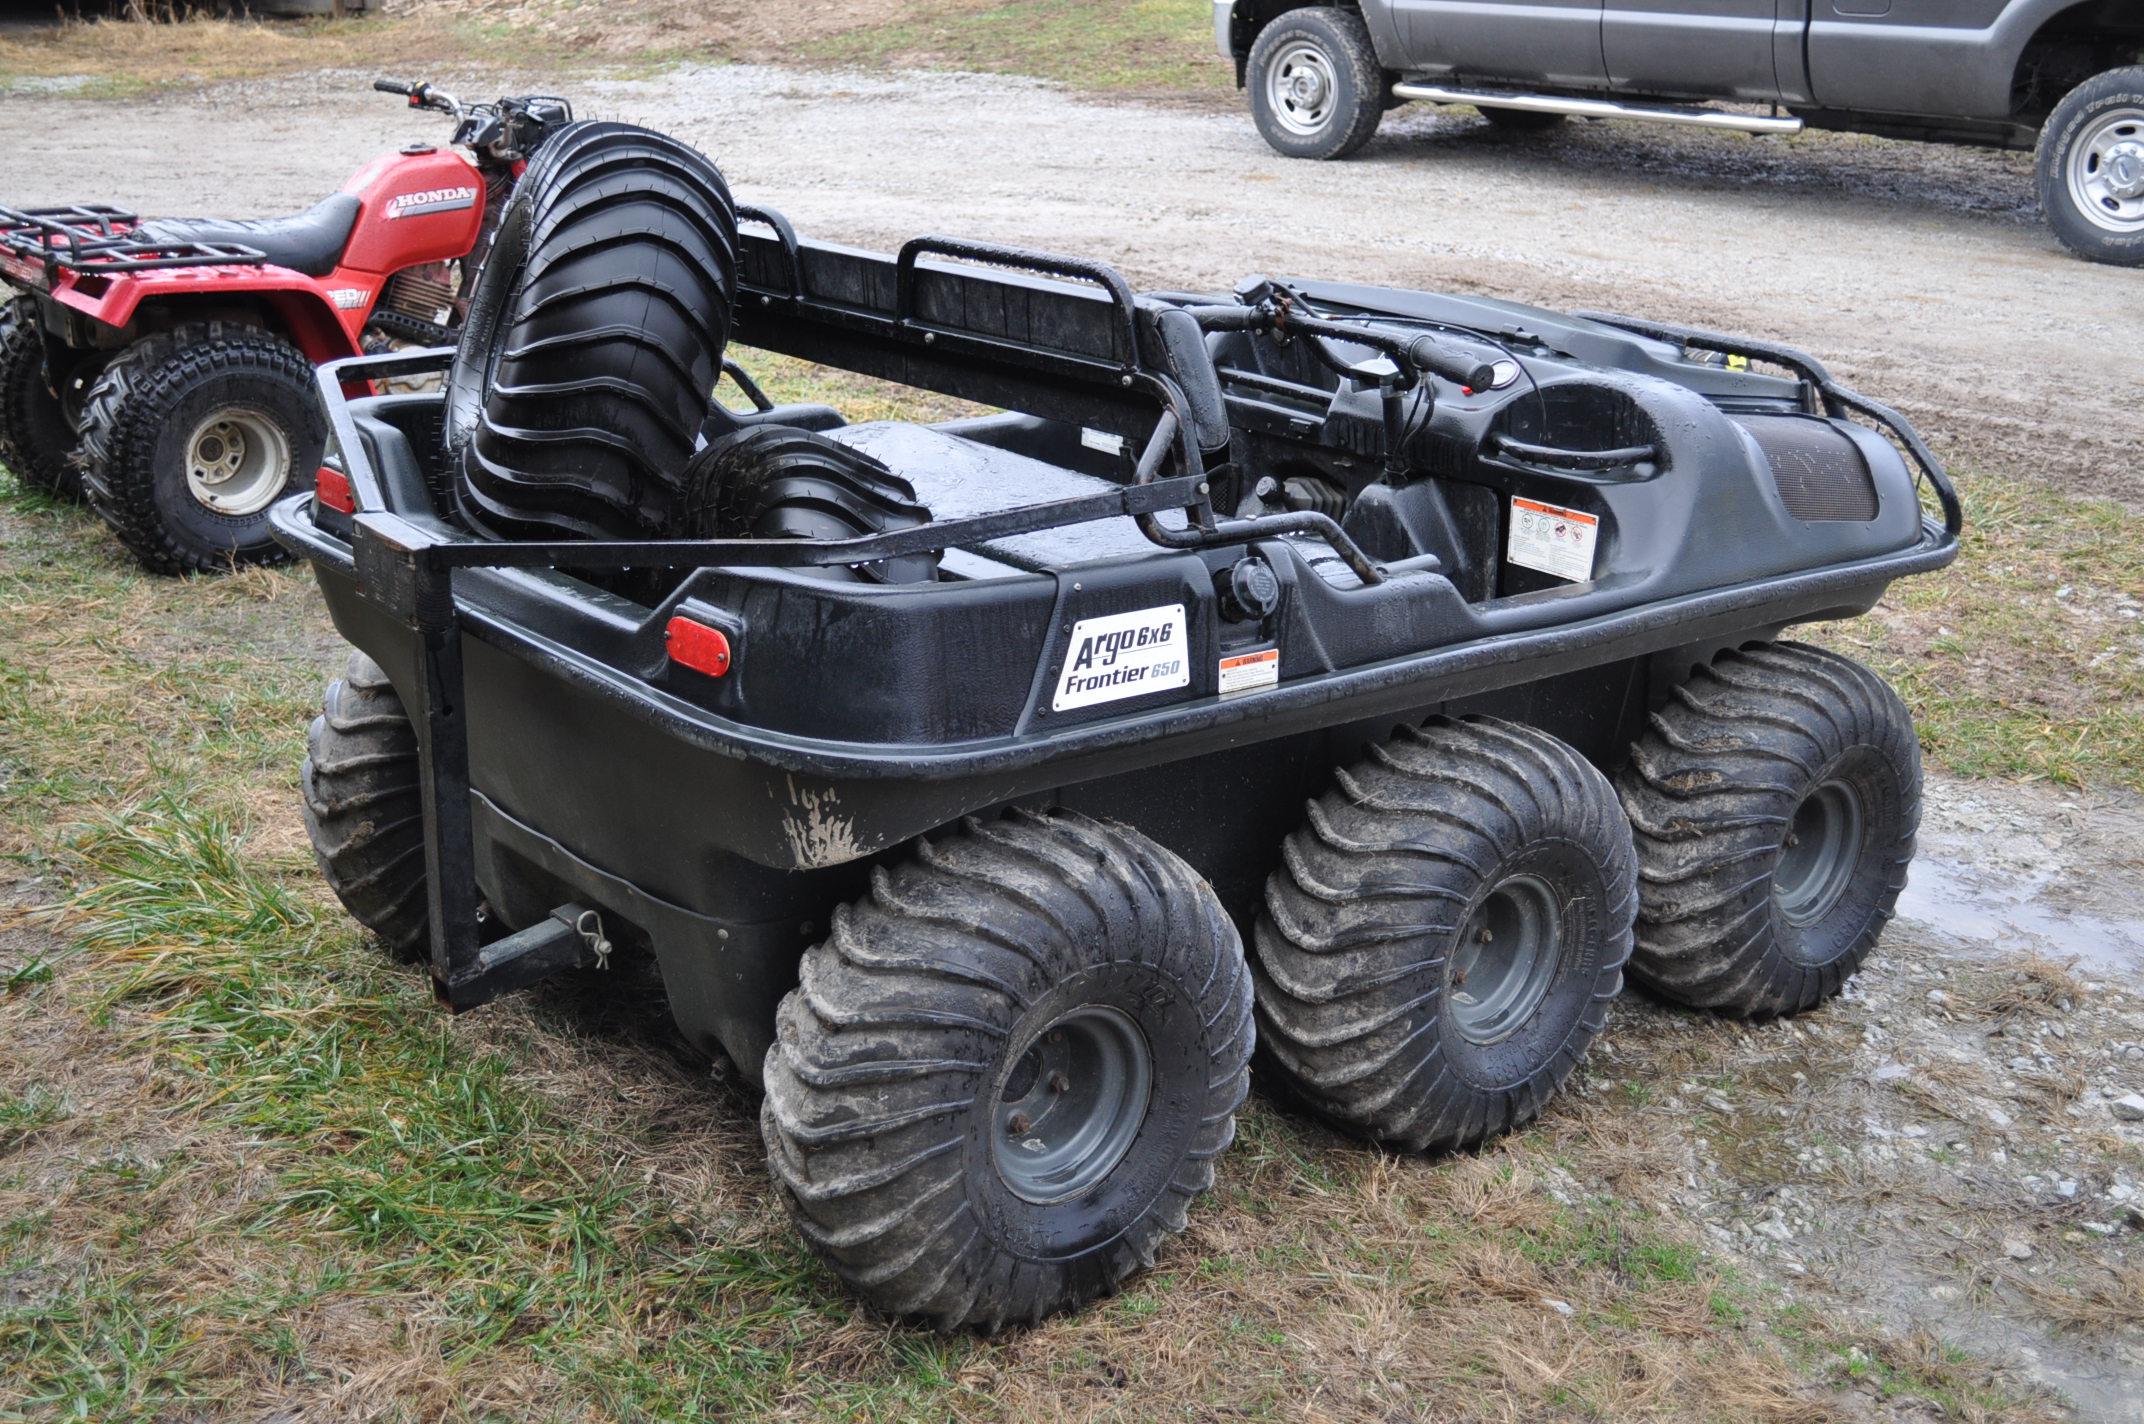 2008 Argo Frontier 650 6x6 ATV, 24 x 10.00-8 tires, 256 hrs - Image 3 of 8